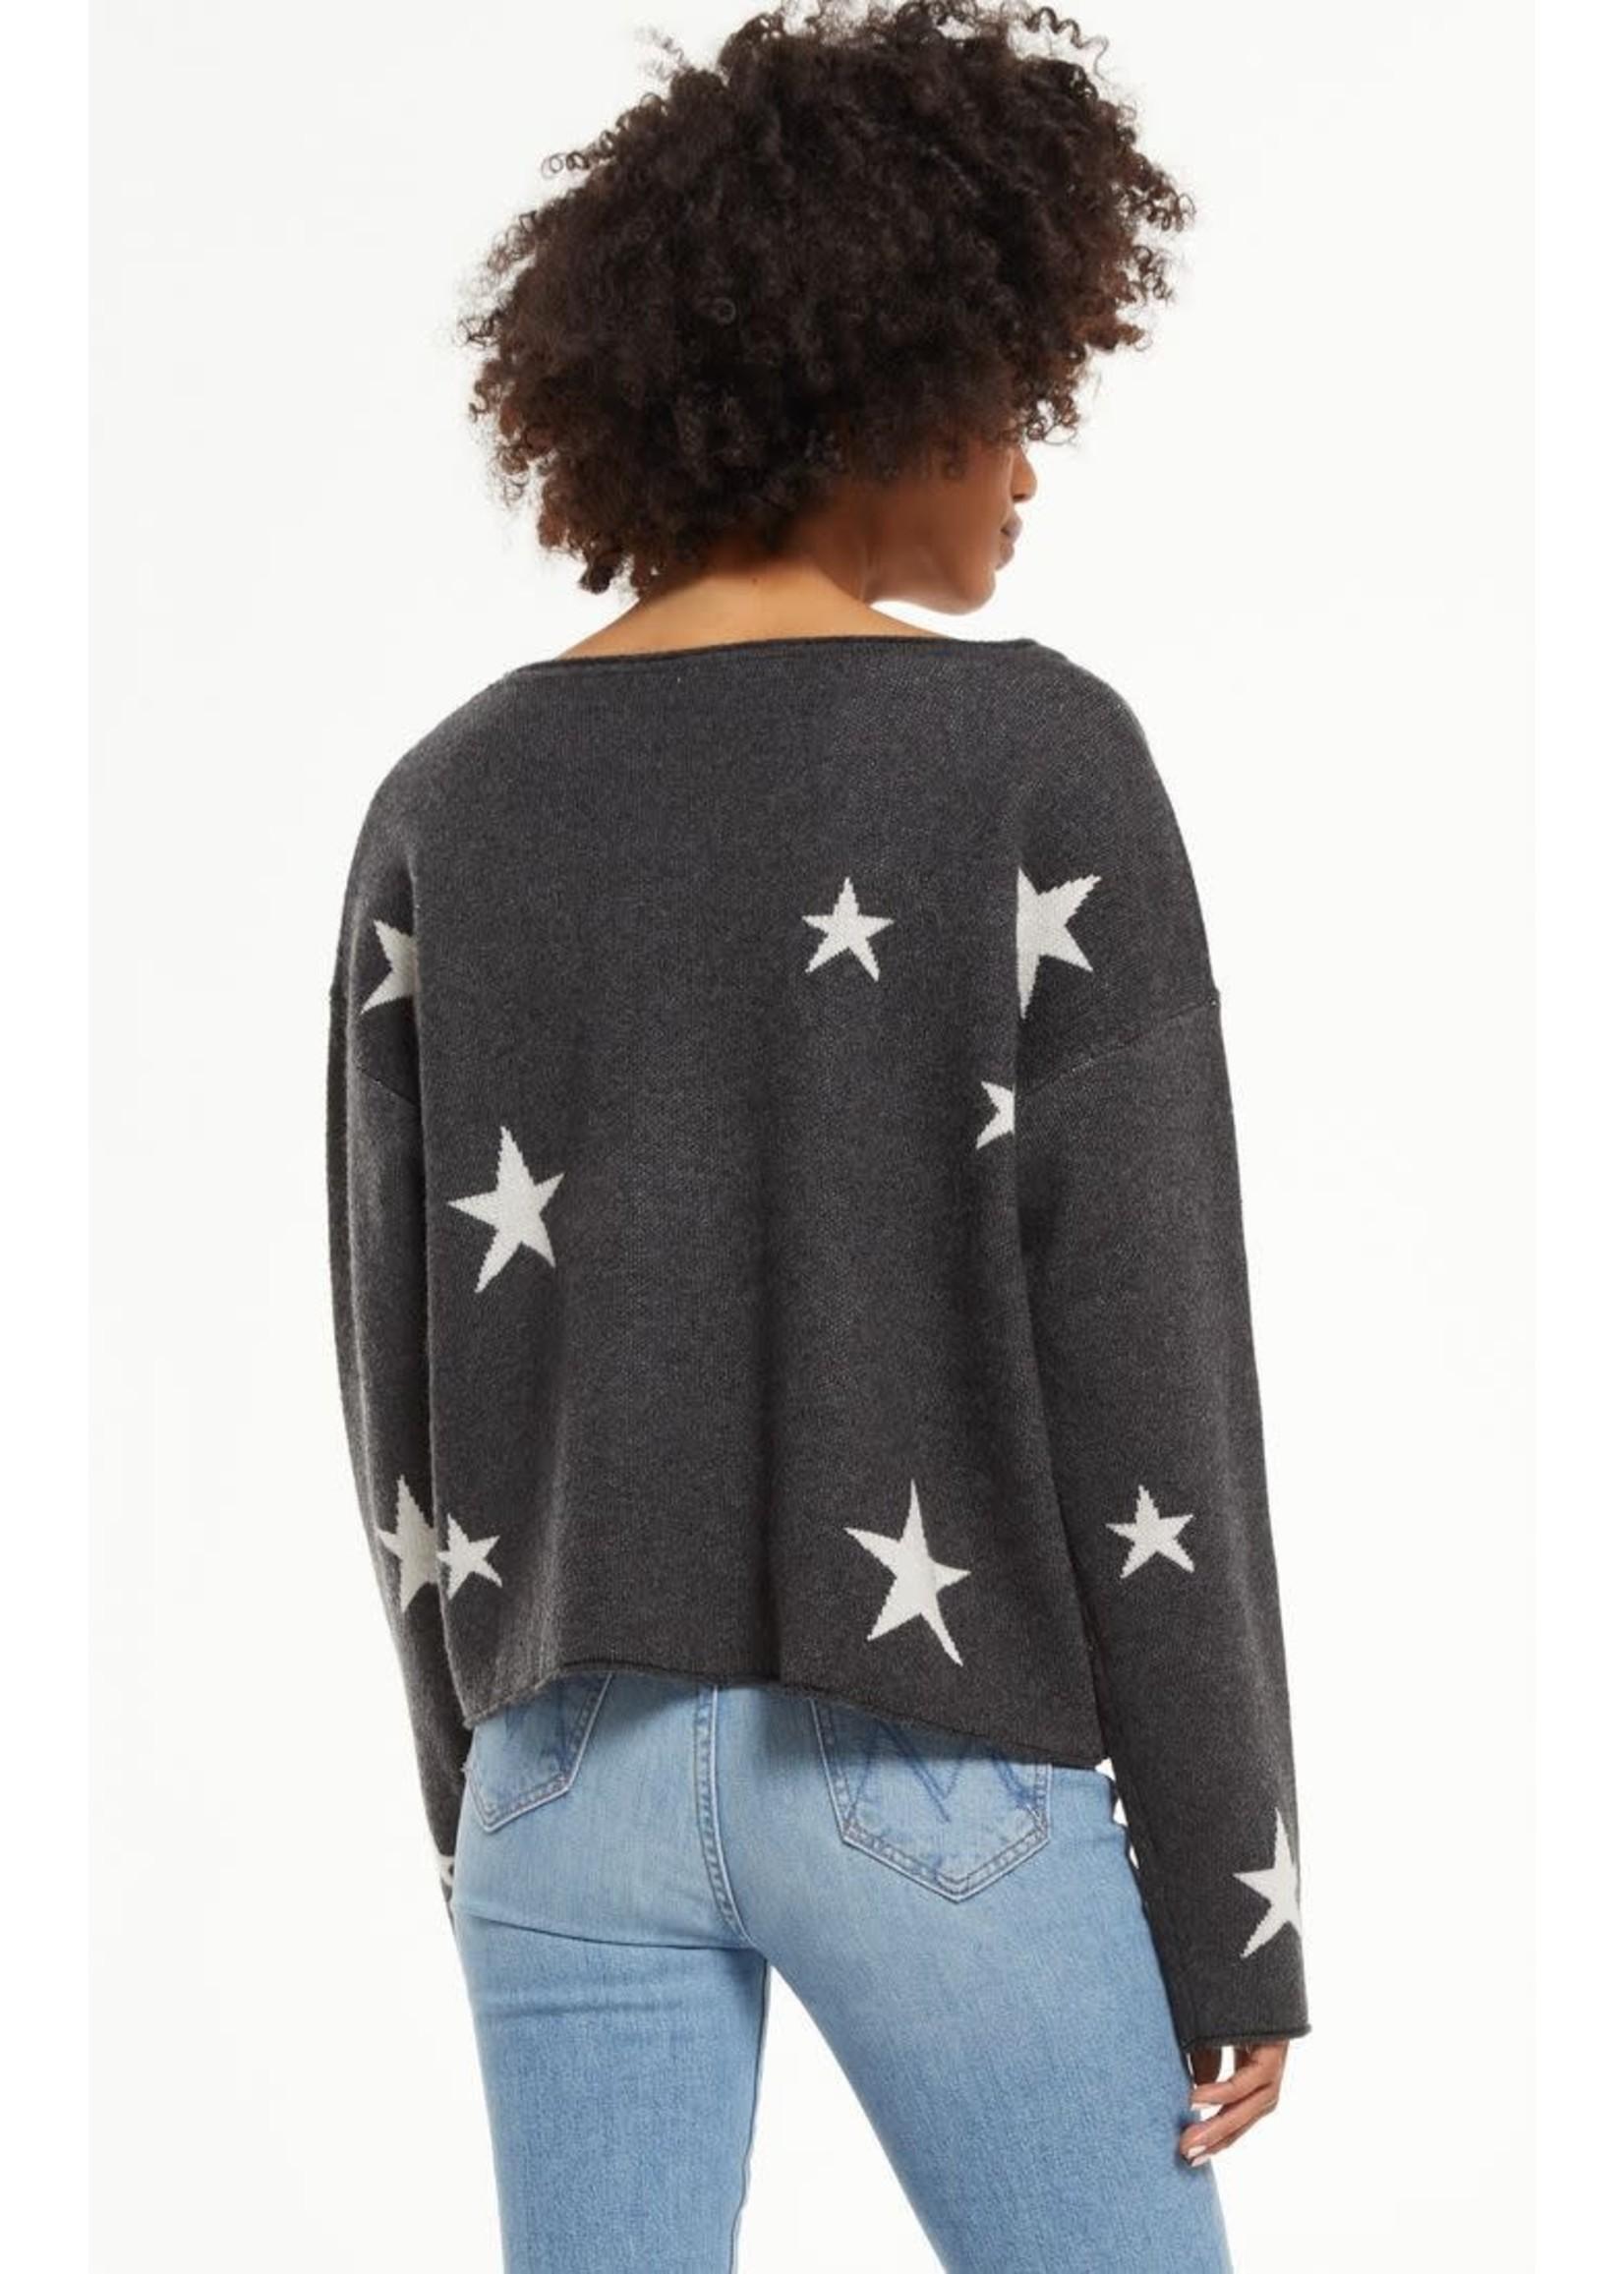 Z Supply Kennedy Sweater